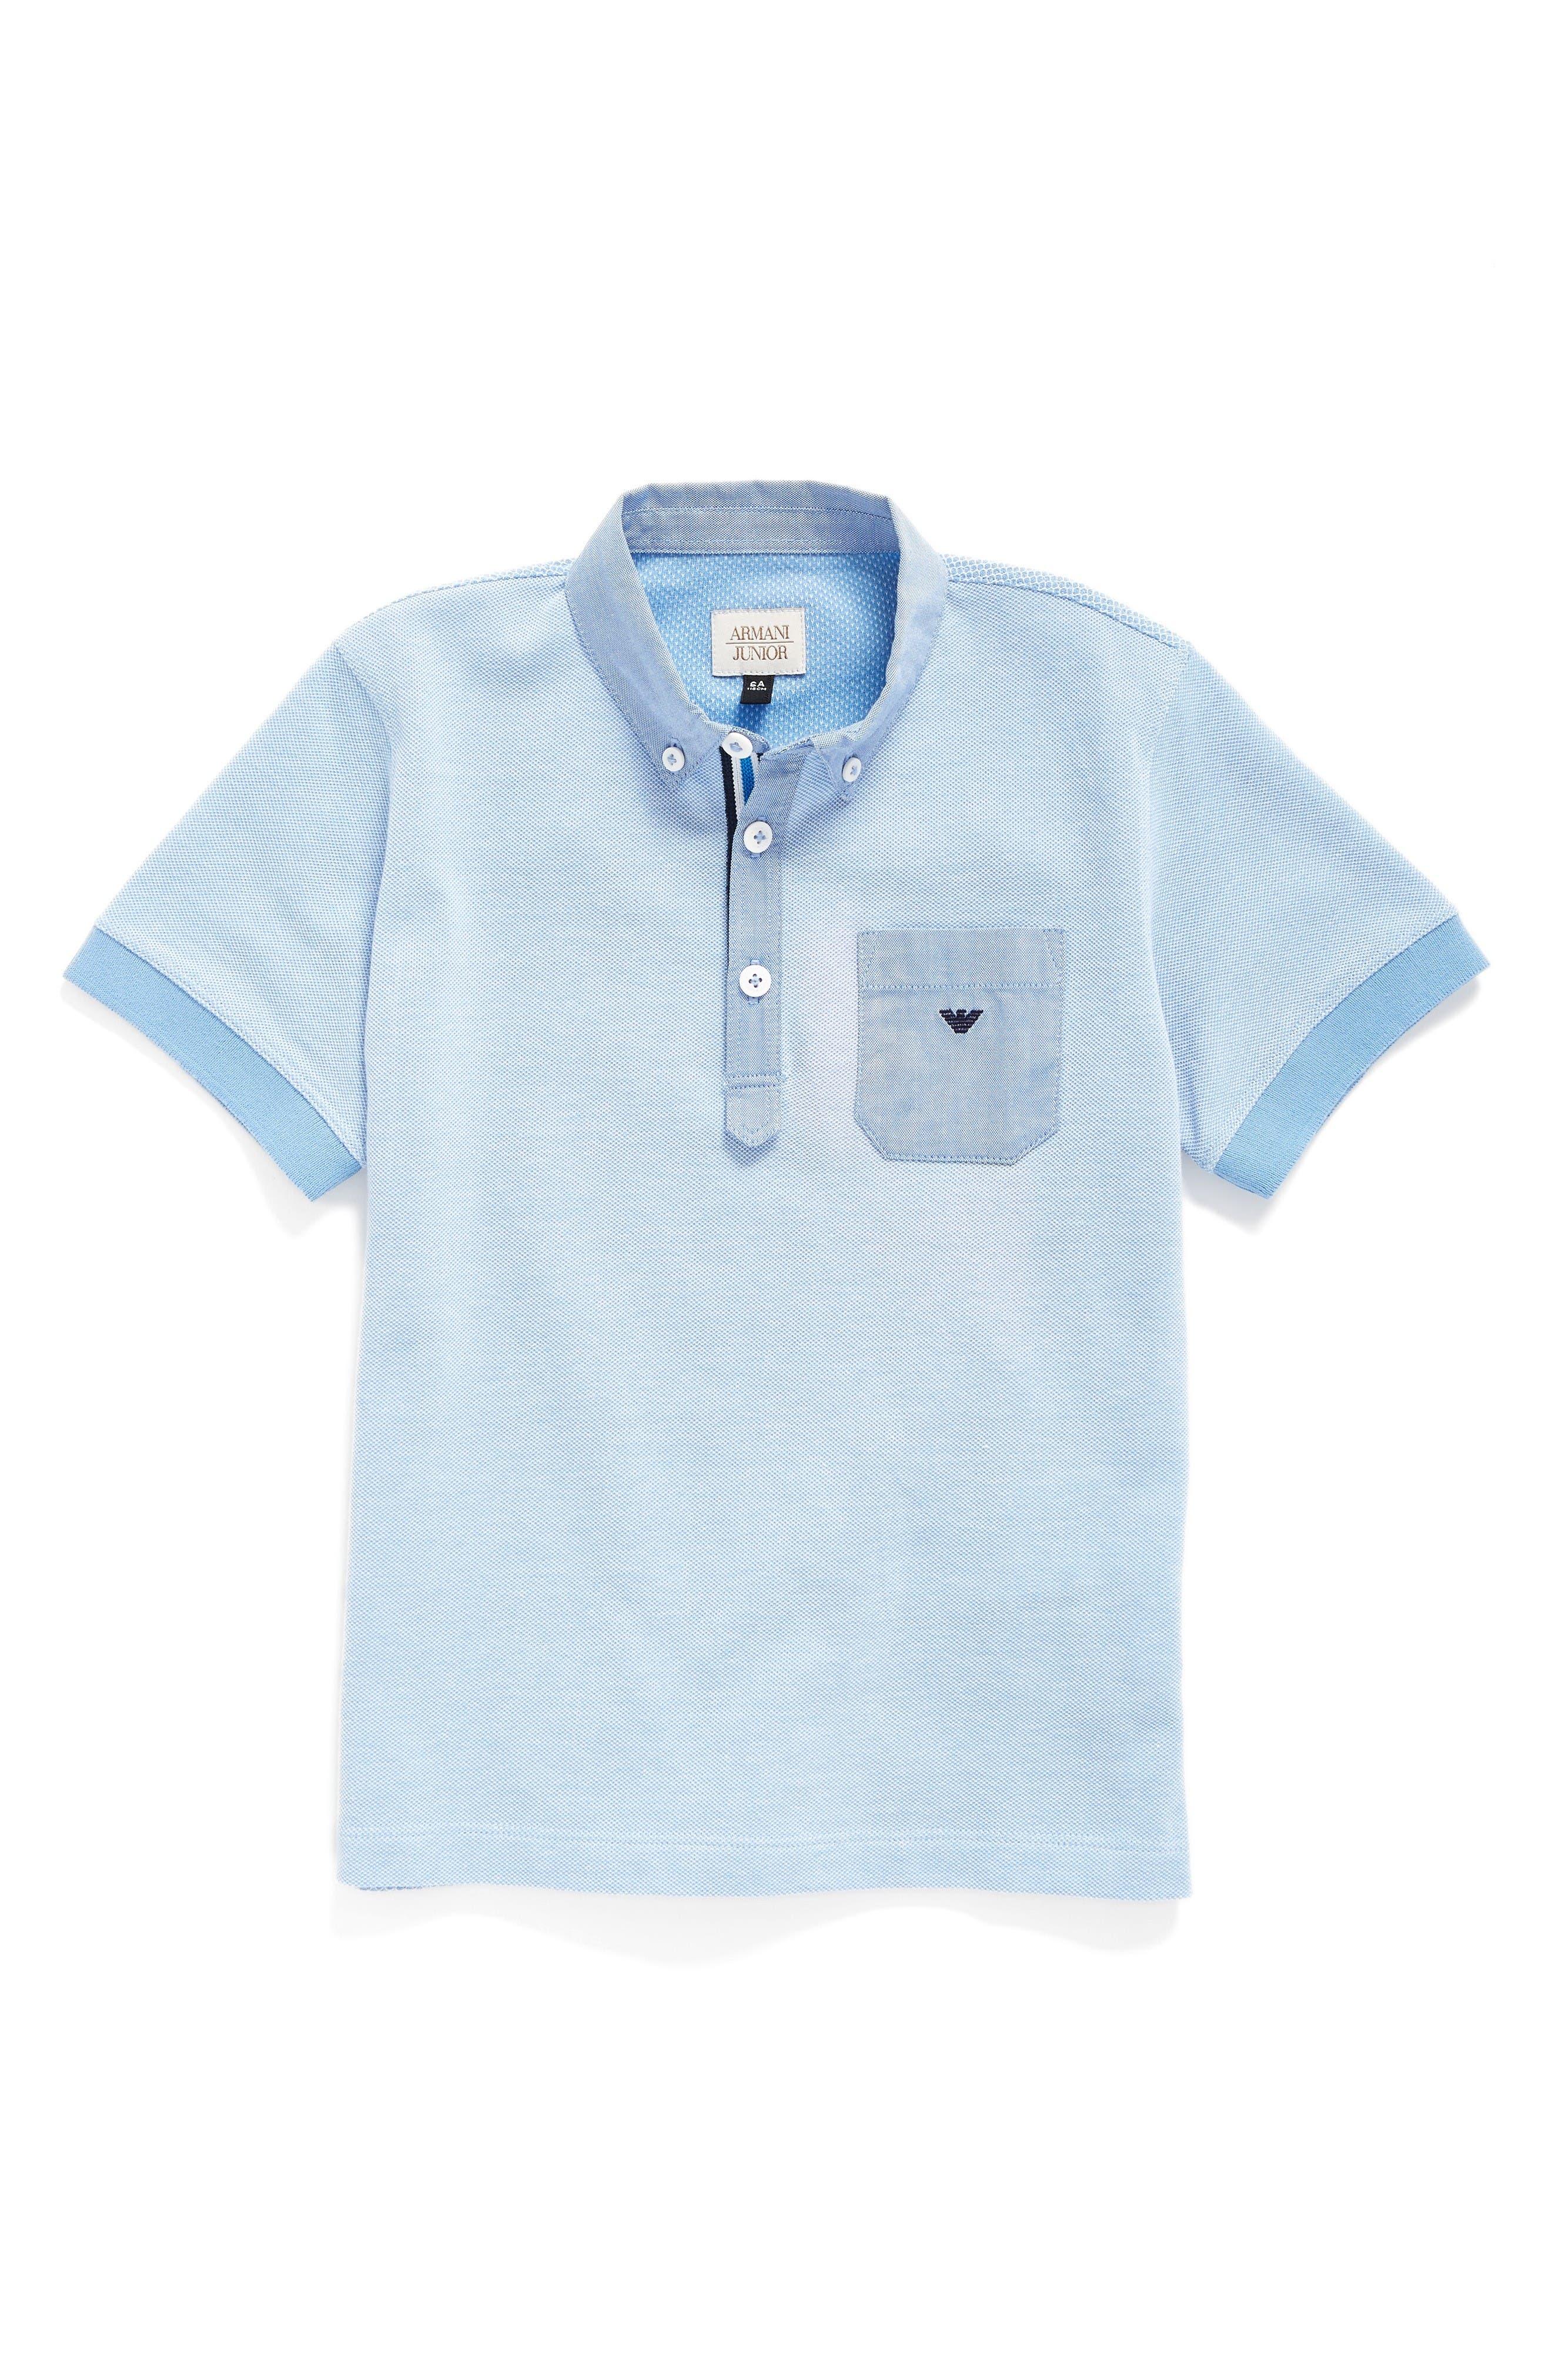 Piqué Polo,                         Main,                         color, Turquoise/ Aqua